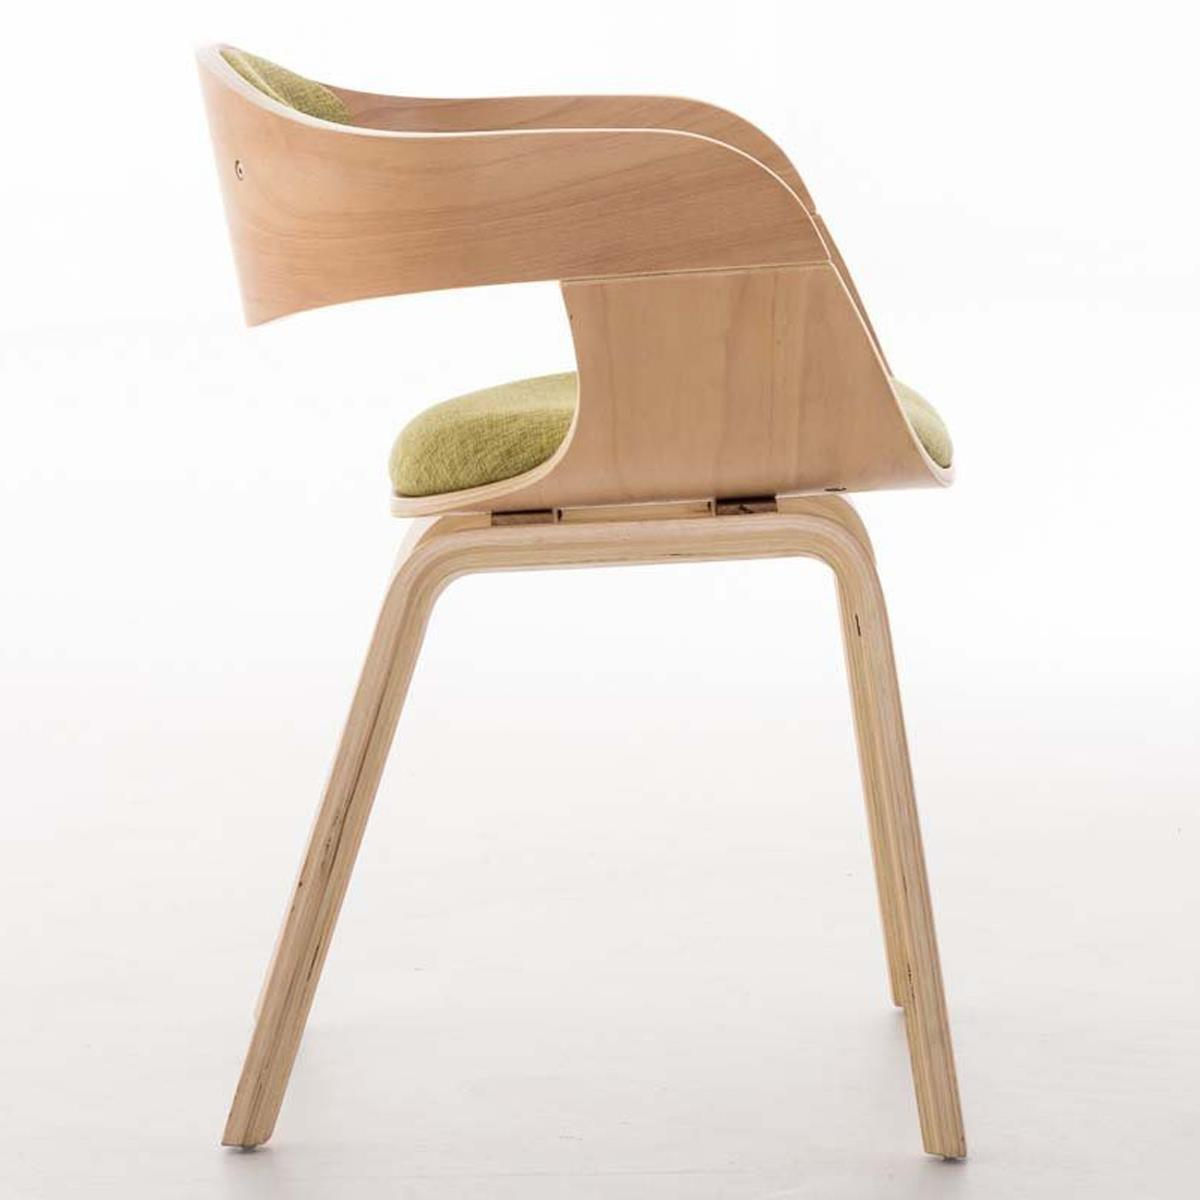 Silla de comedor bolonia tapizada en tela color verde - Tela para sillas ...